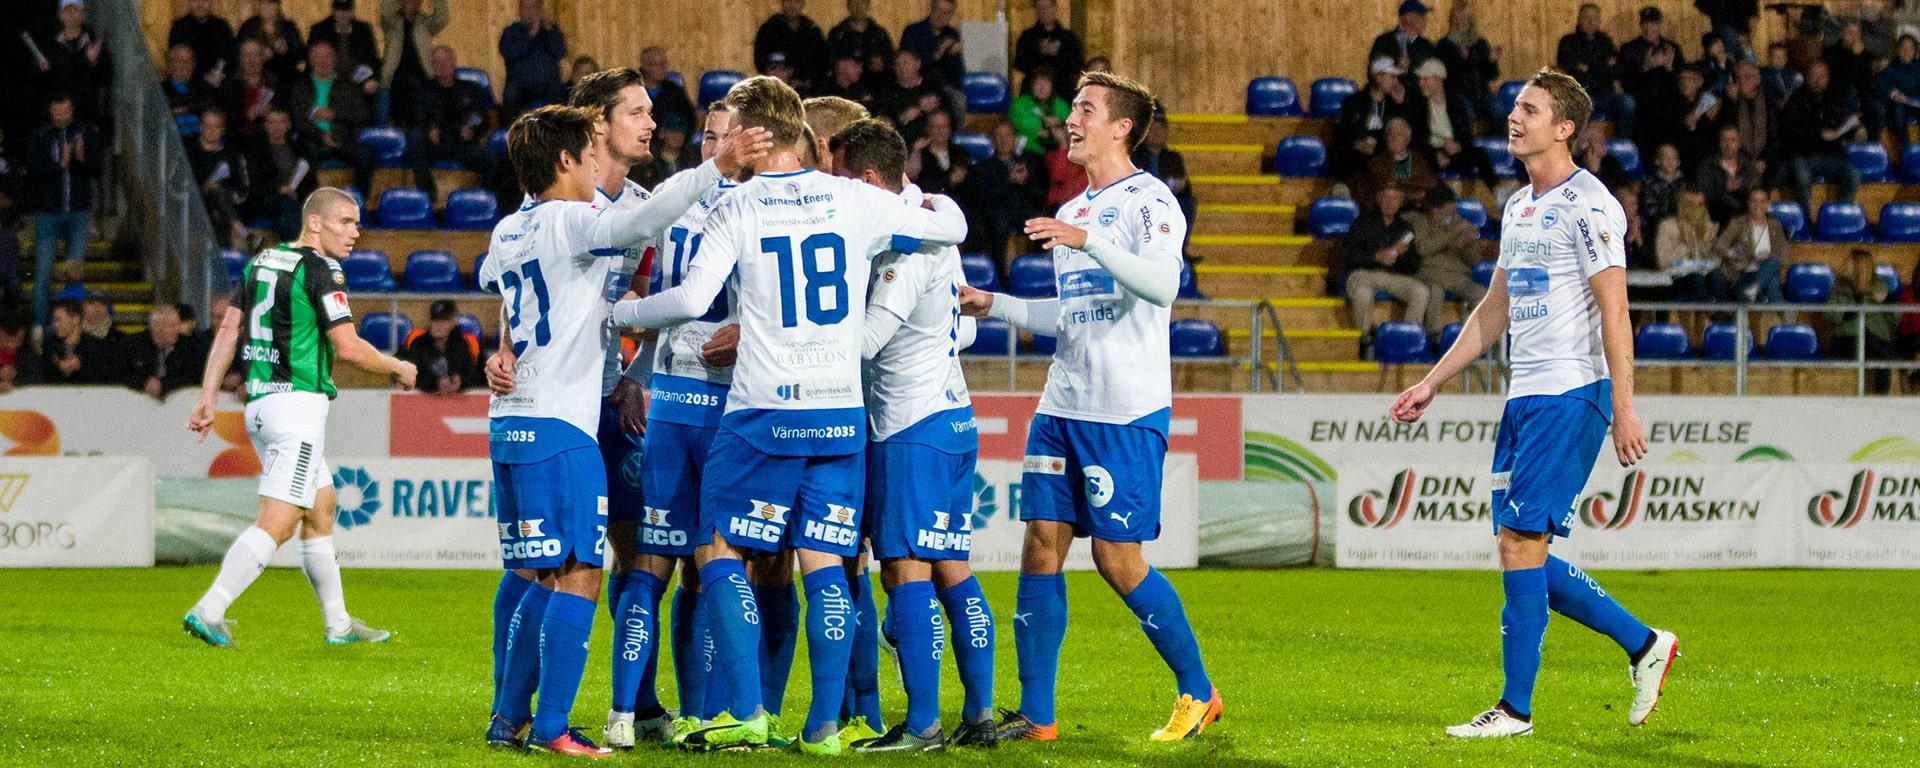 Betting Prediction GAIS vs IFK Värnamo